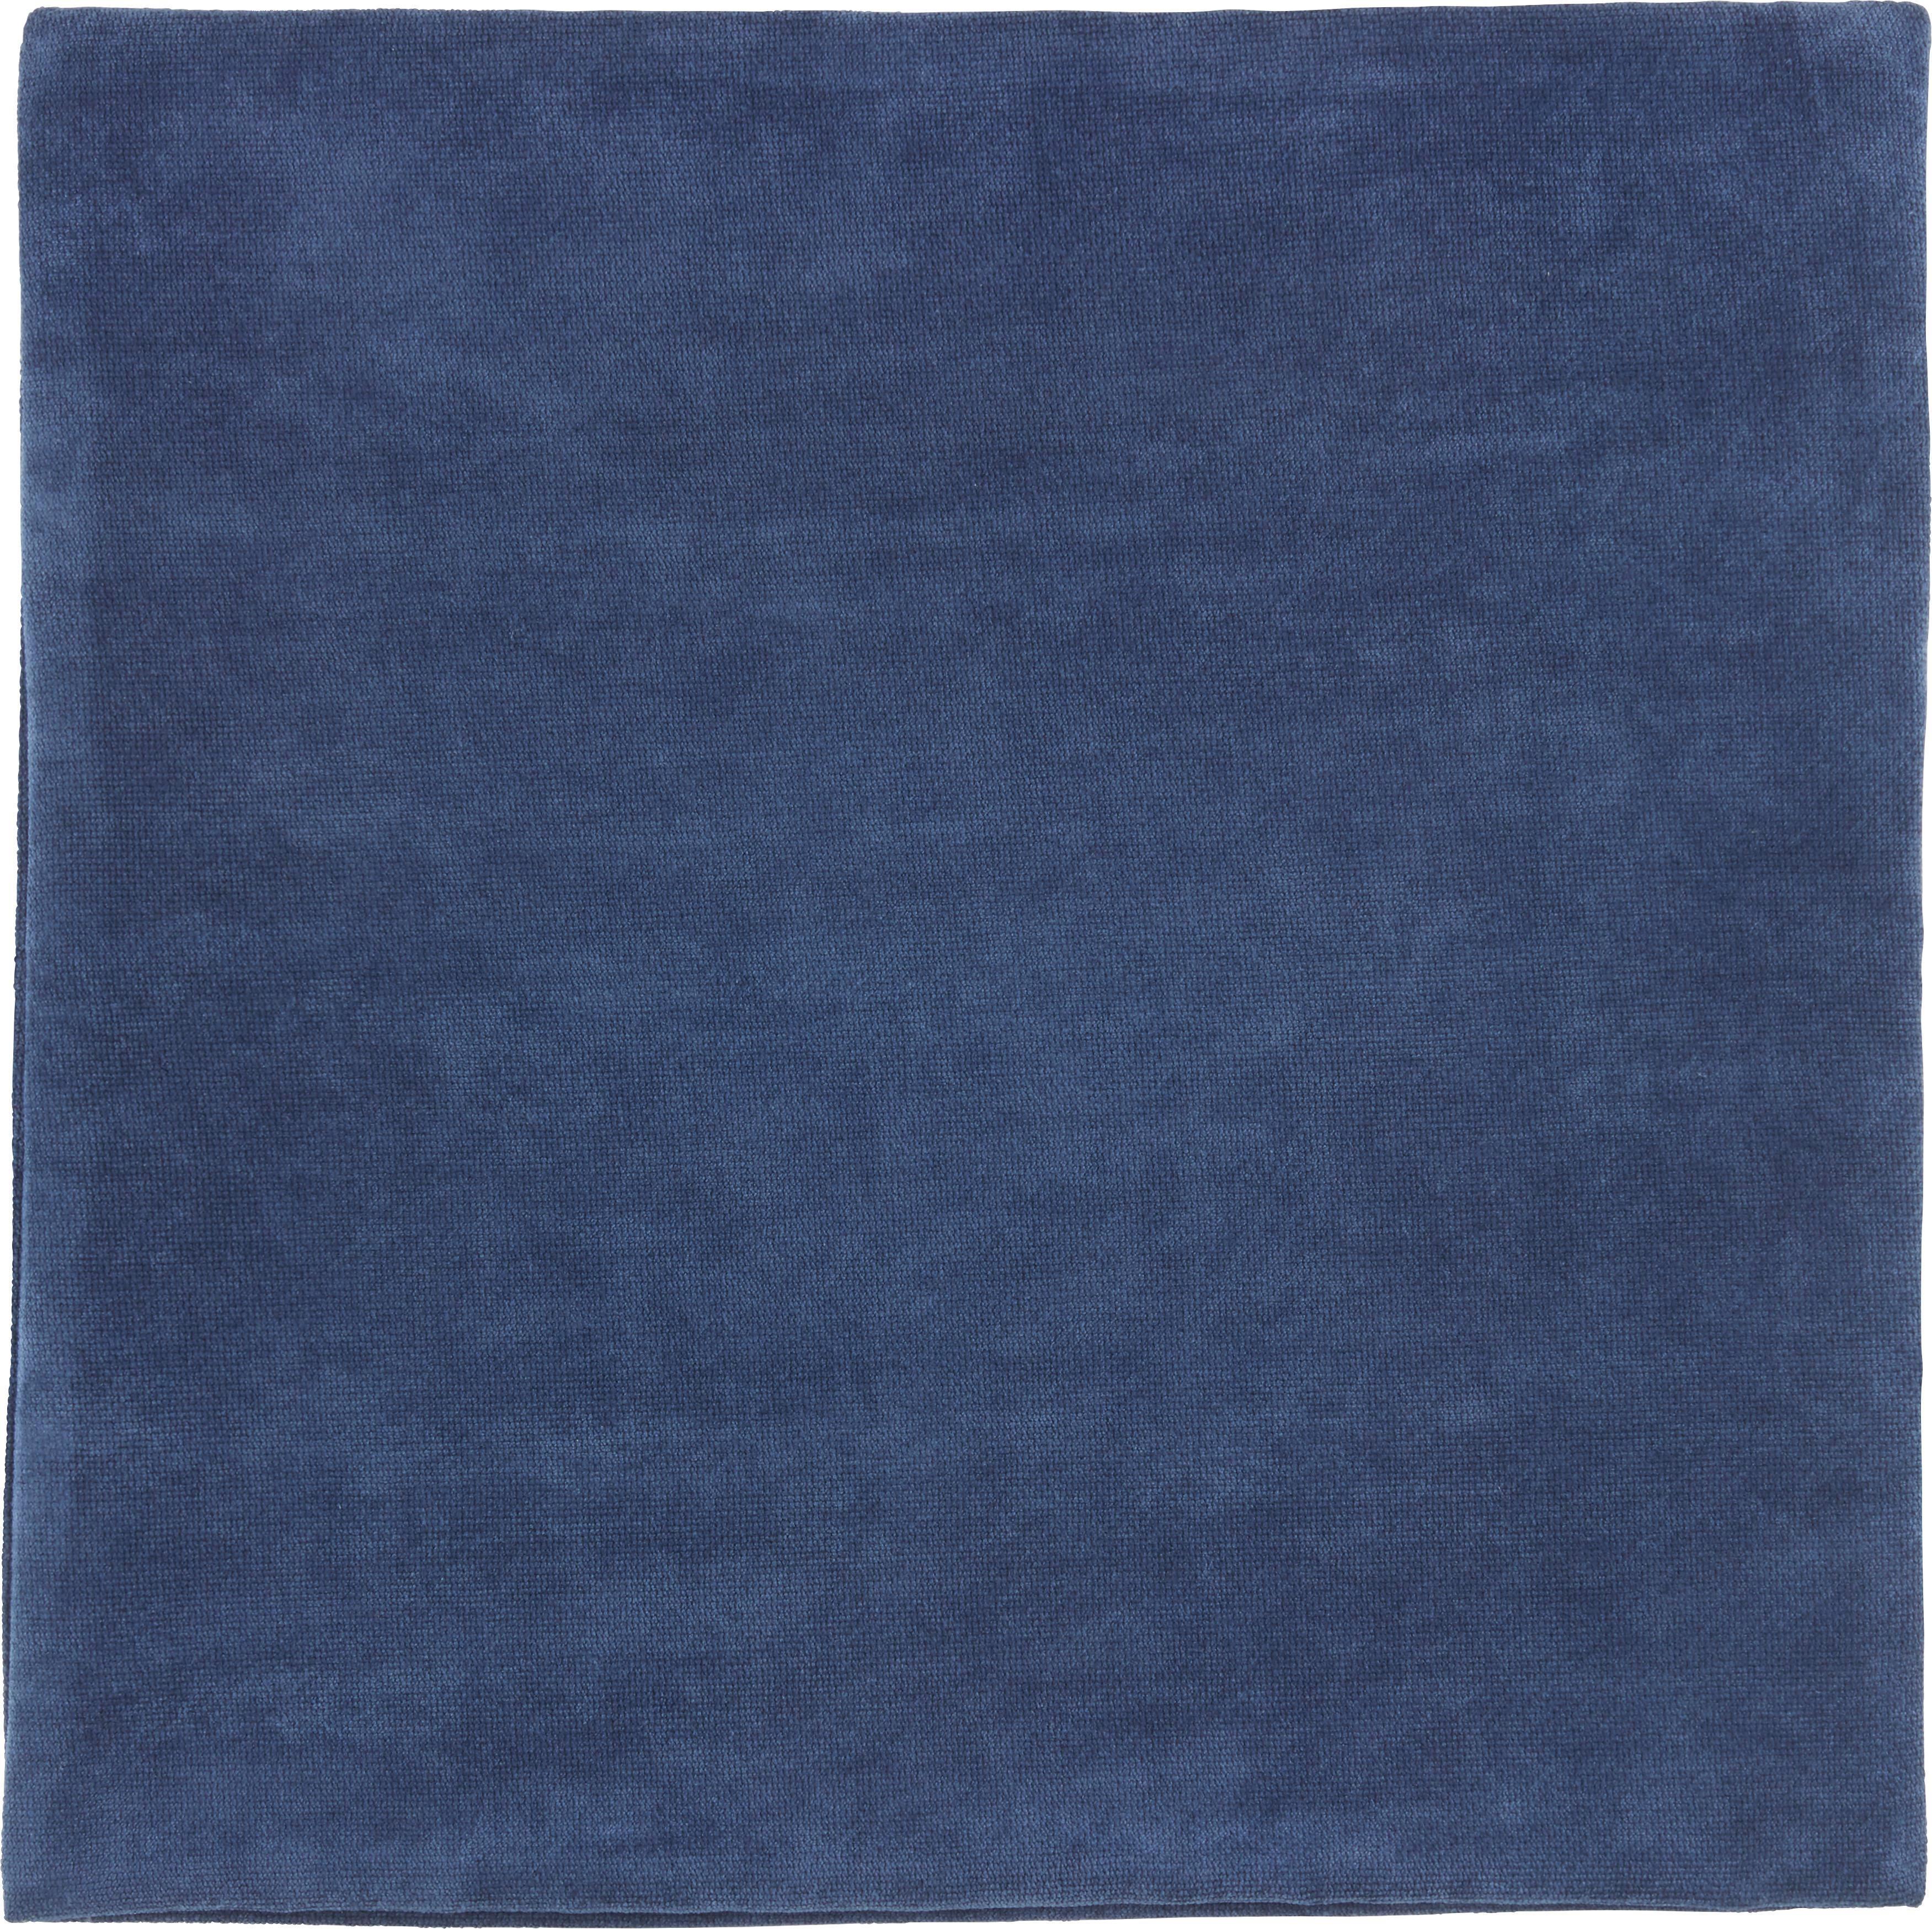 Kissenhülle Marit, ca. 40x40cm - Dunkelblau, Textil (40/40cm) - MÖMAX modern living